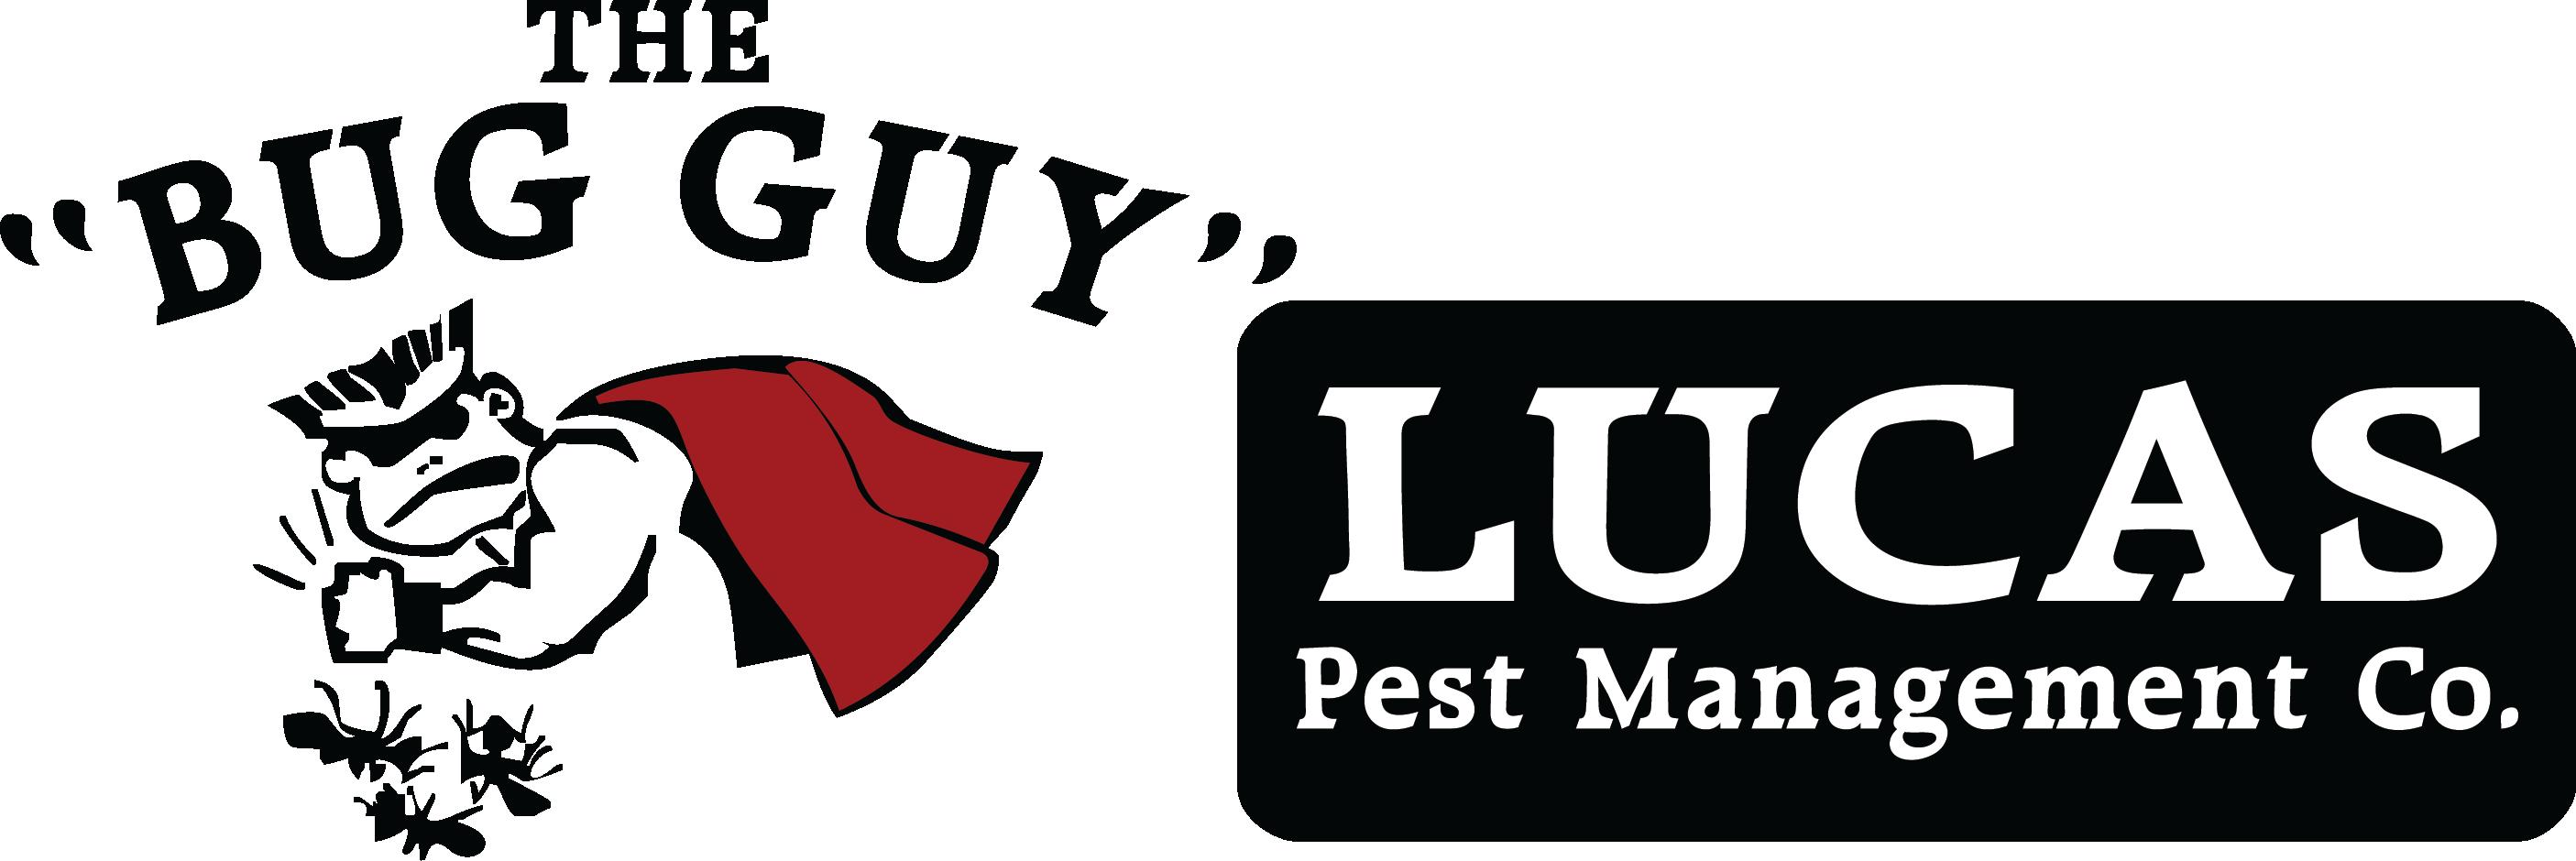 Lucas Pest Management-The Bug Guy